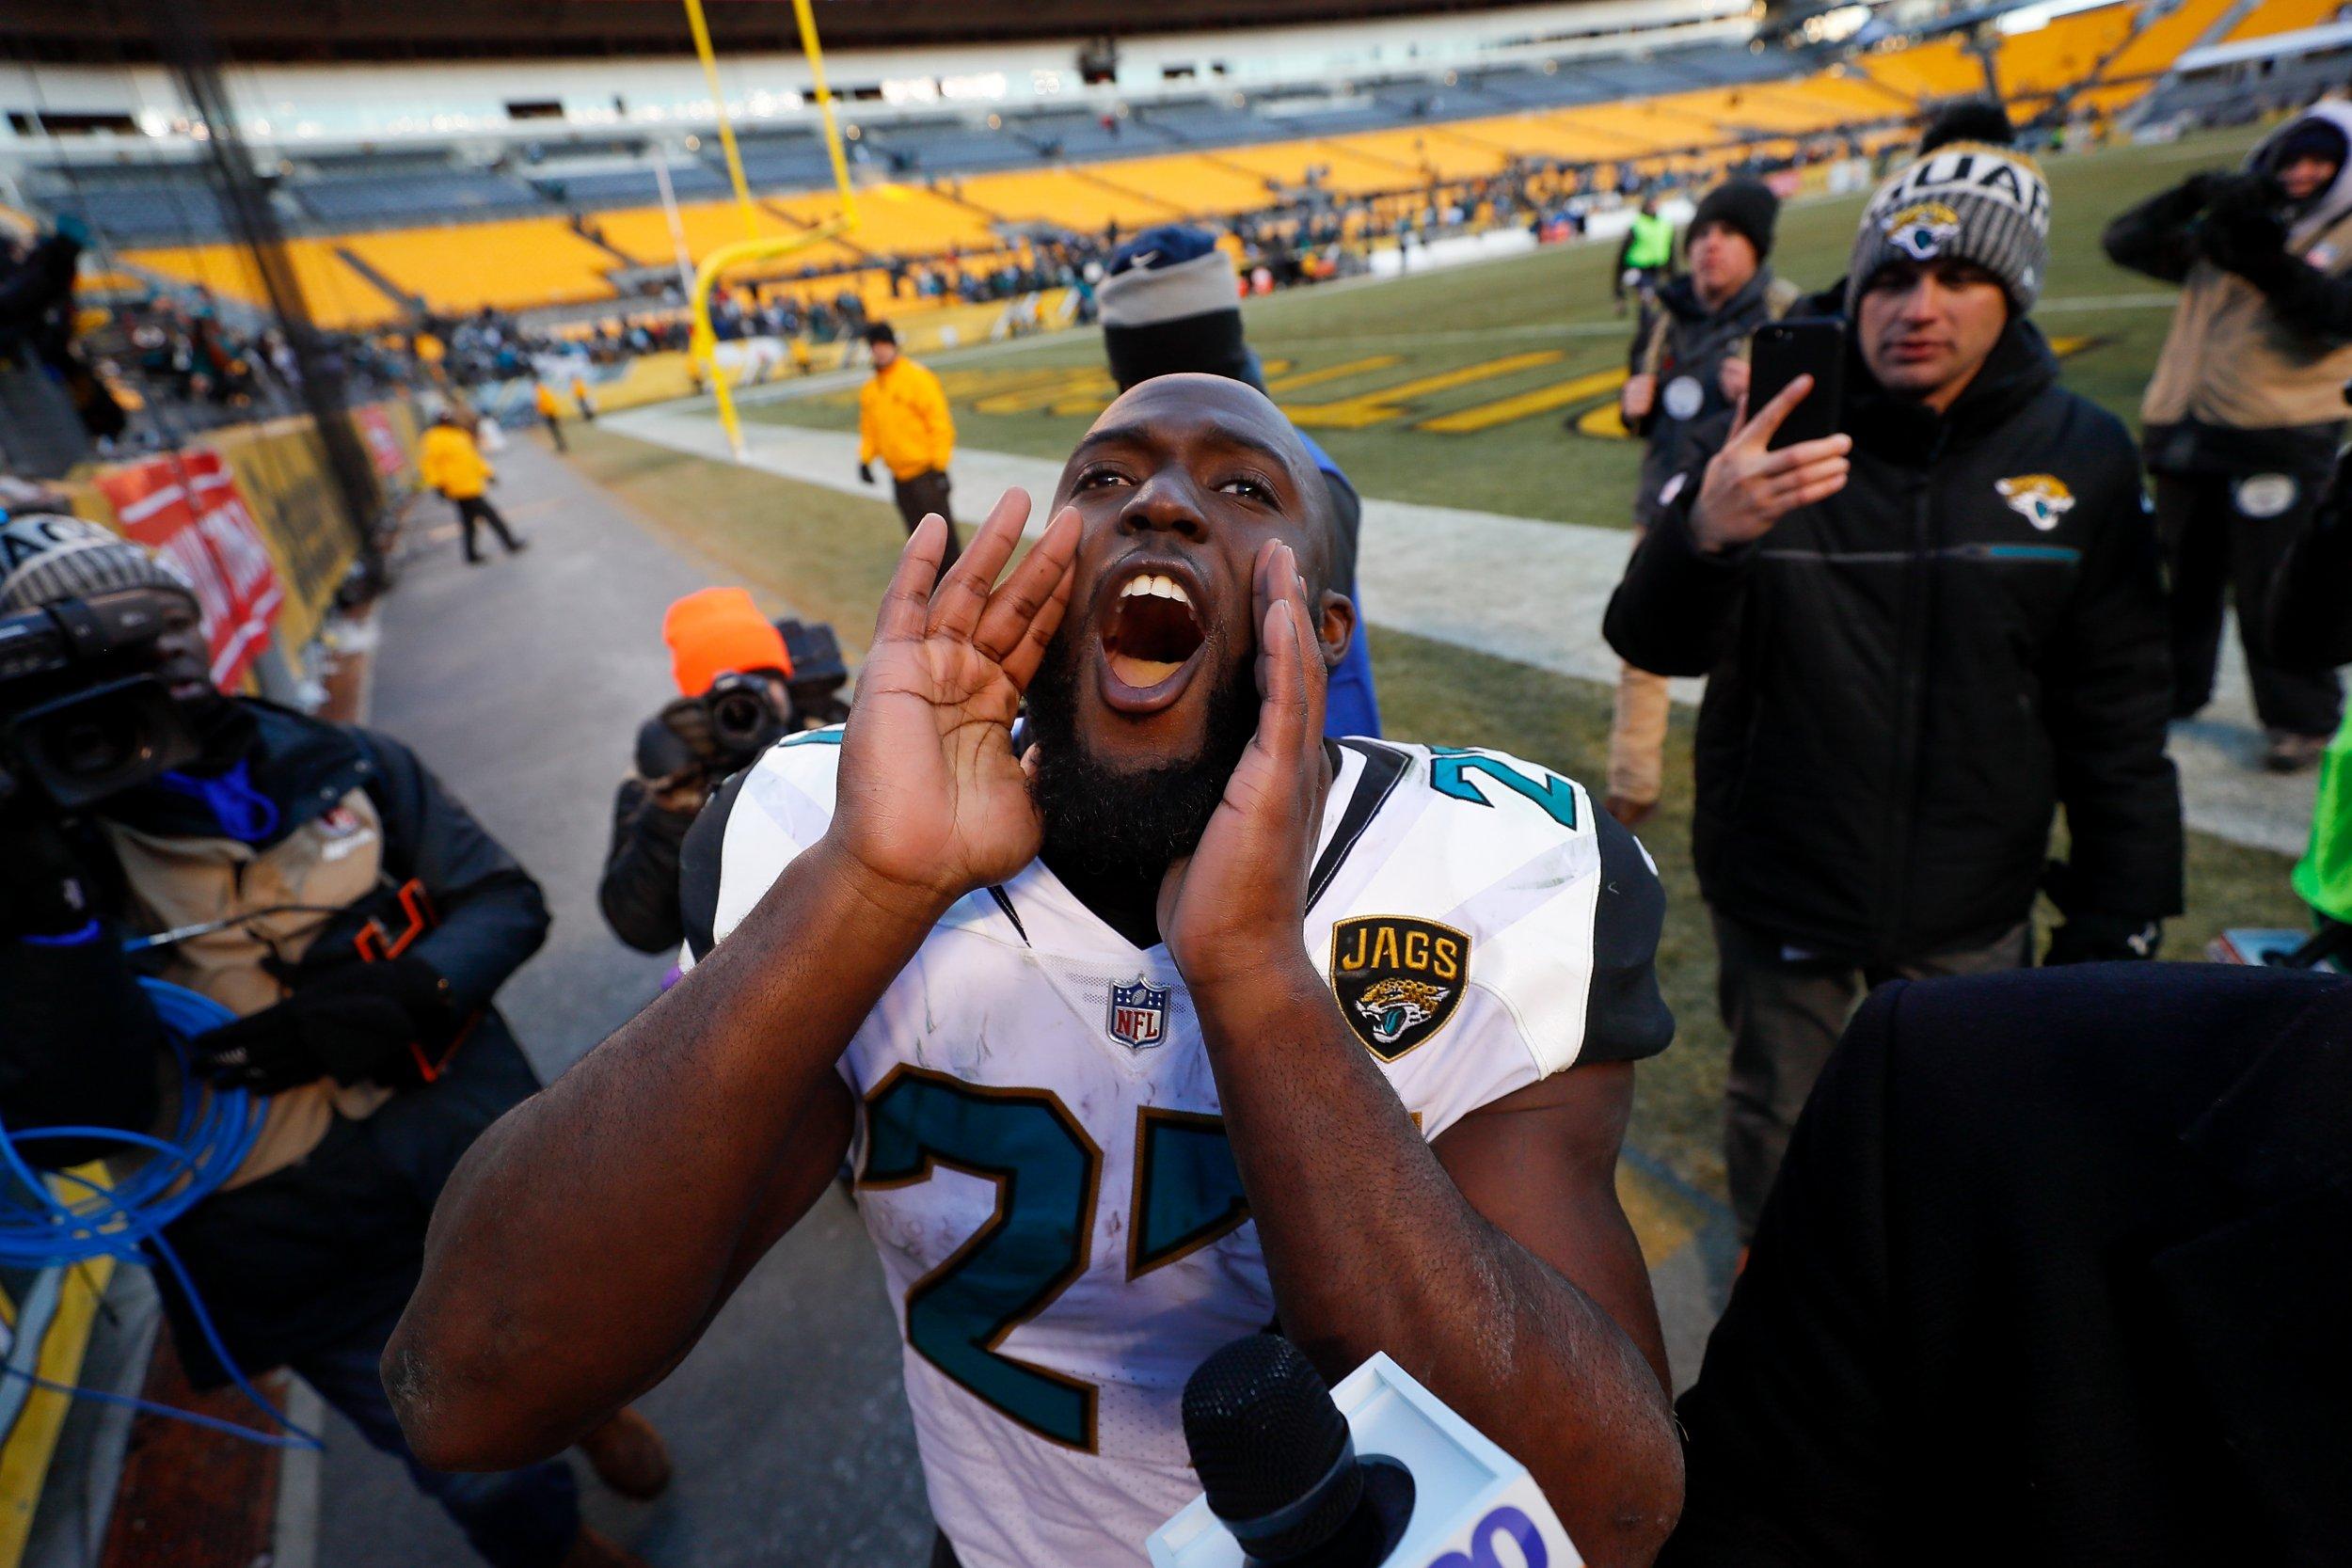 Leonard Fournette of the Jacksonville Jaguars at Heinz Field, Pittsburgh, January 14.